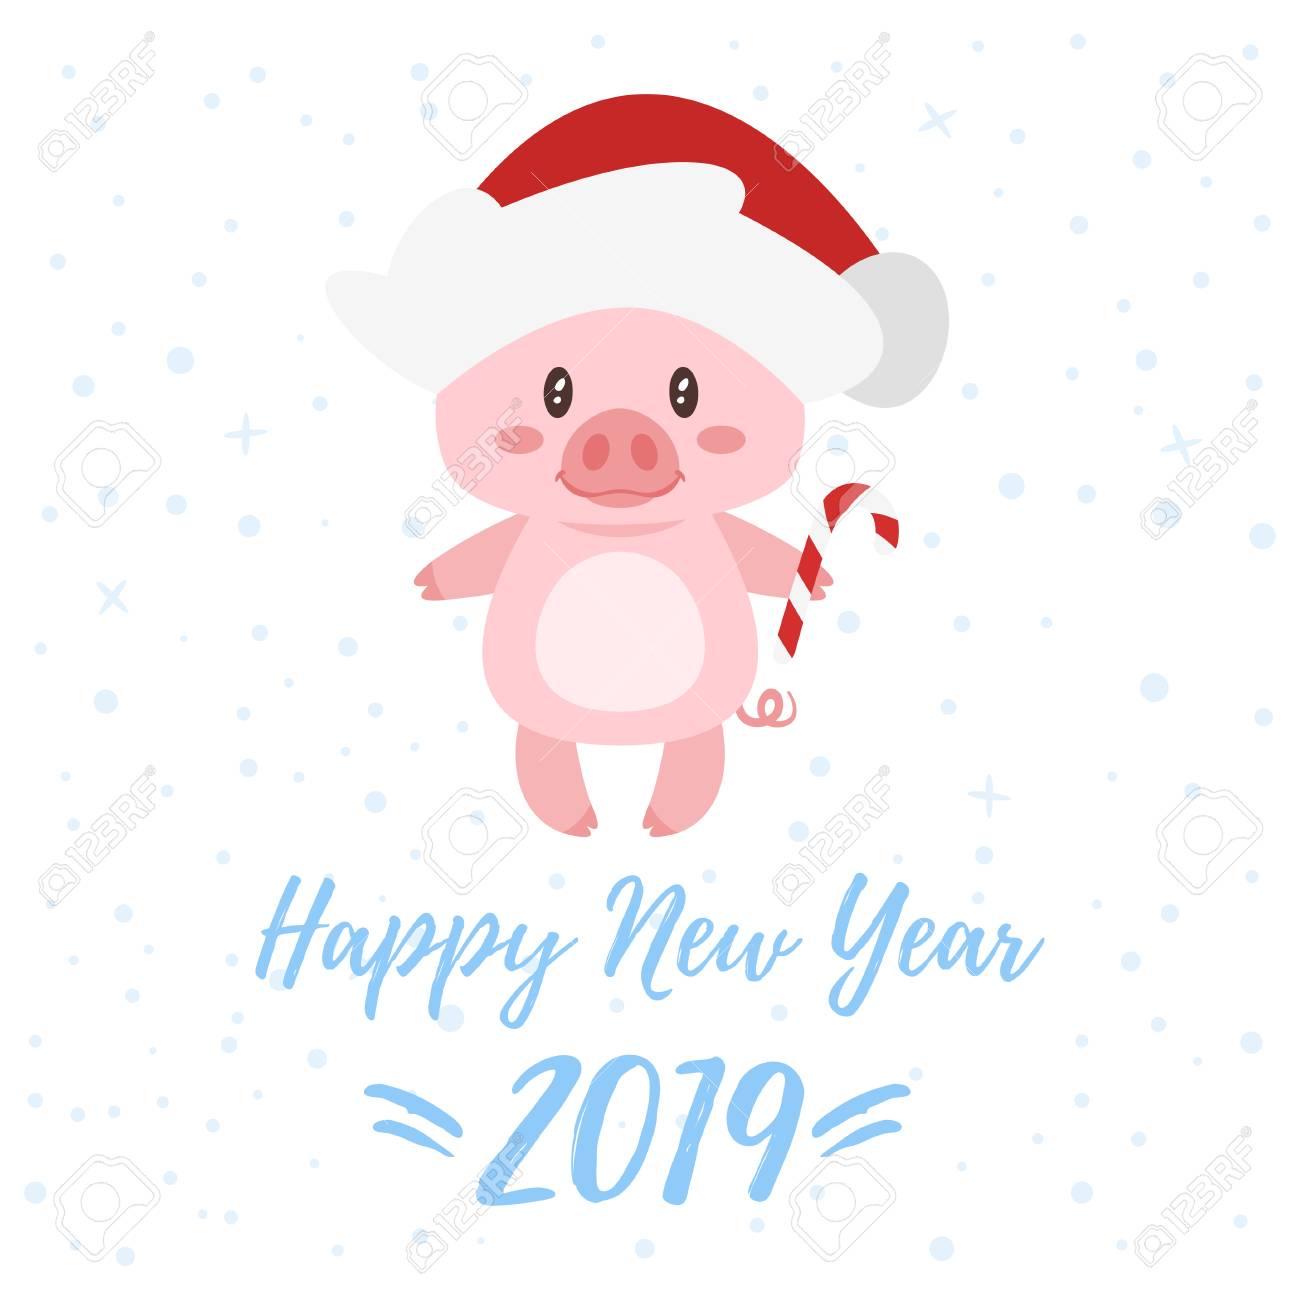 happy new year 2019 mong không ế nữa ahihi